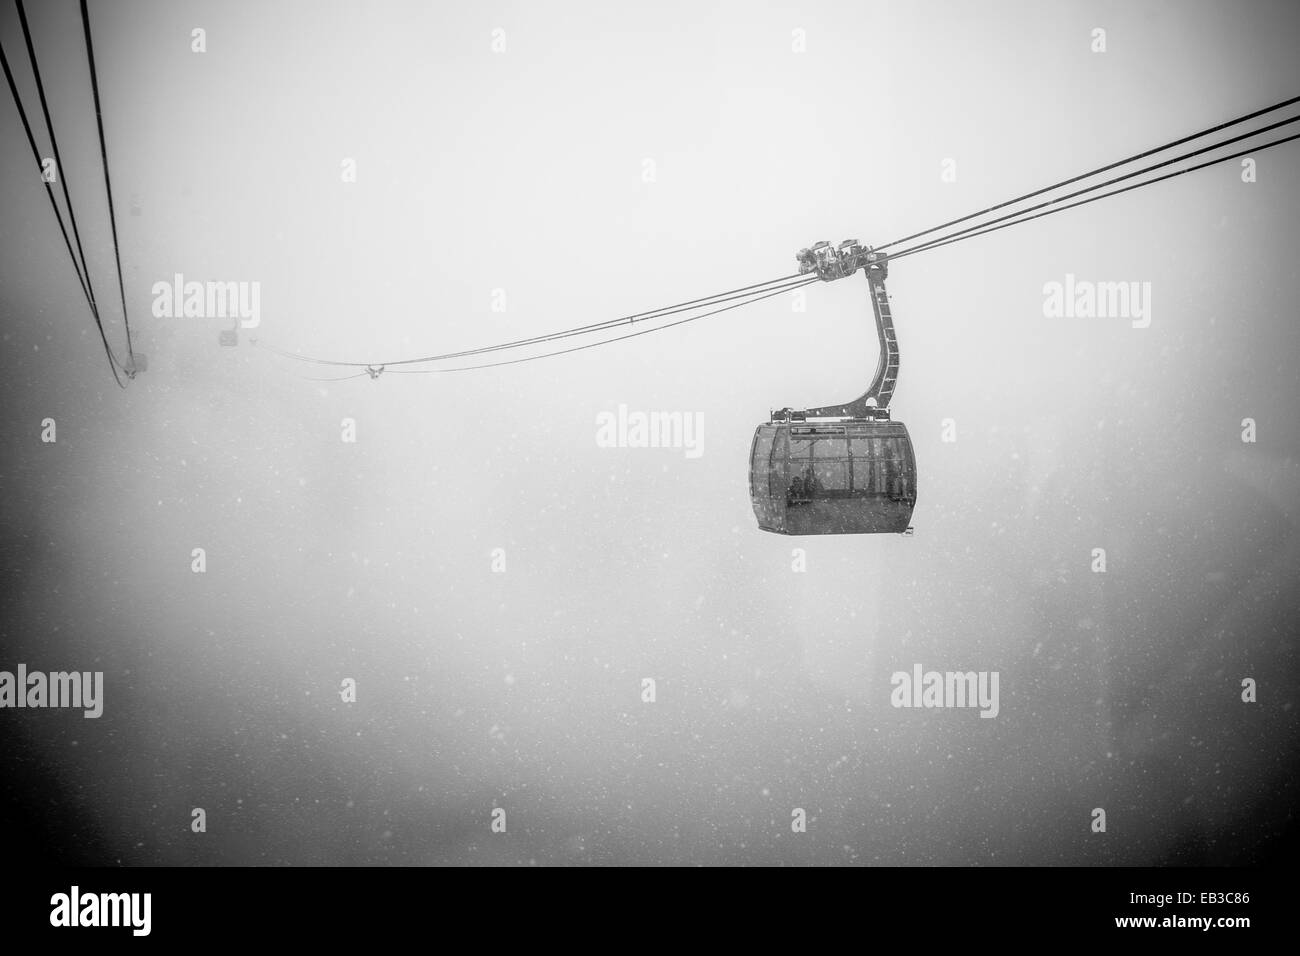 Canada, British Columbia, Gondola in heavy snow fall in Whistler Stock Photo